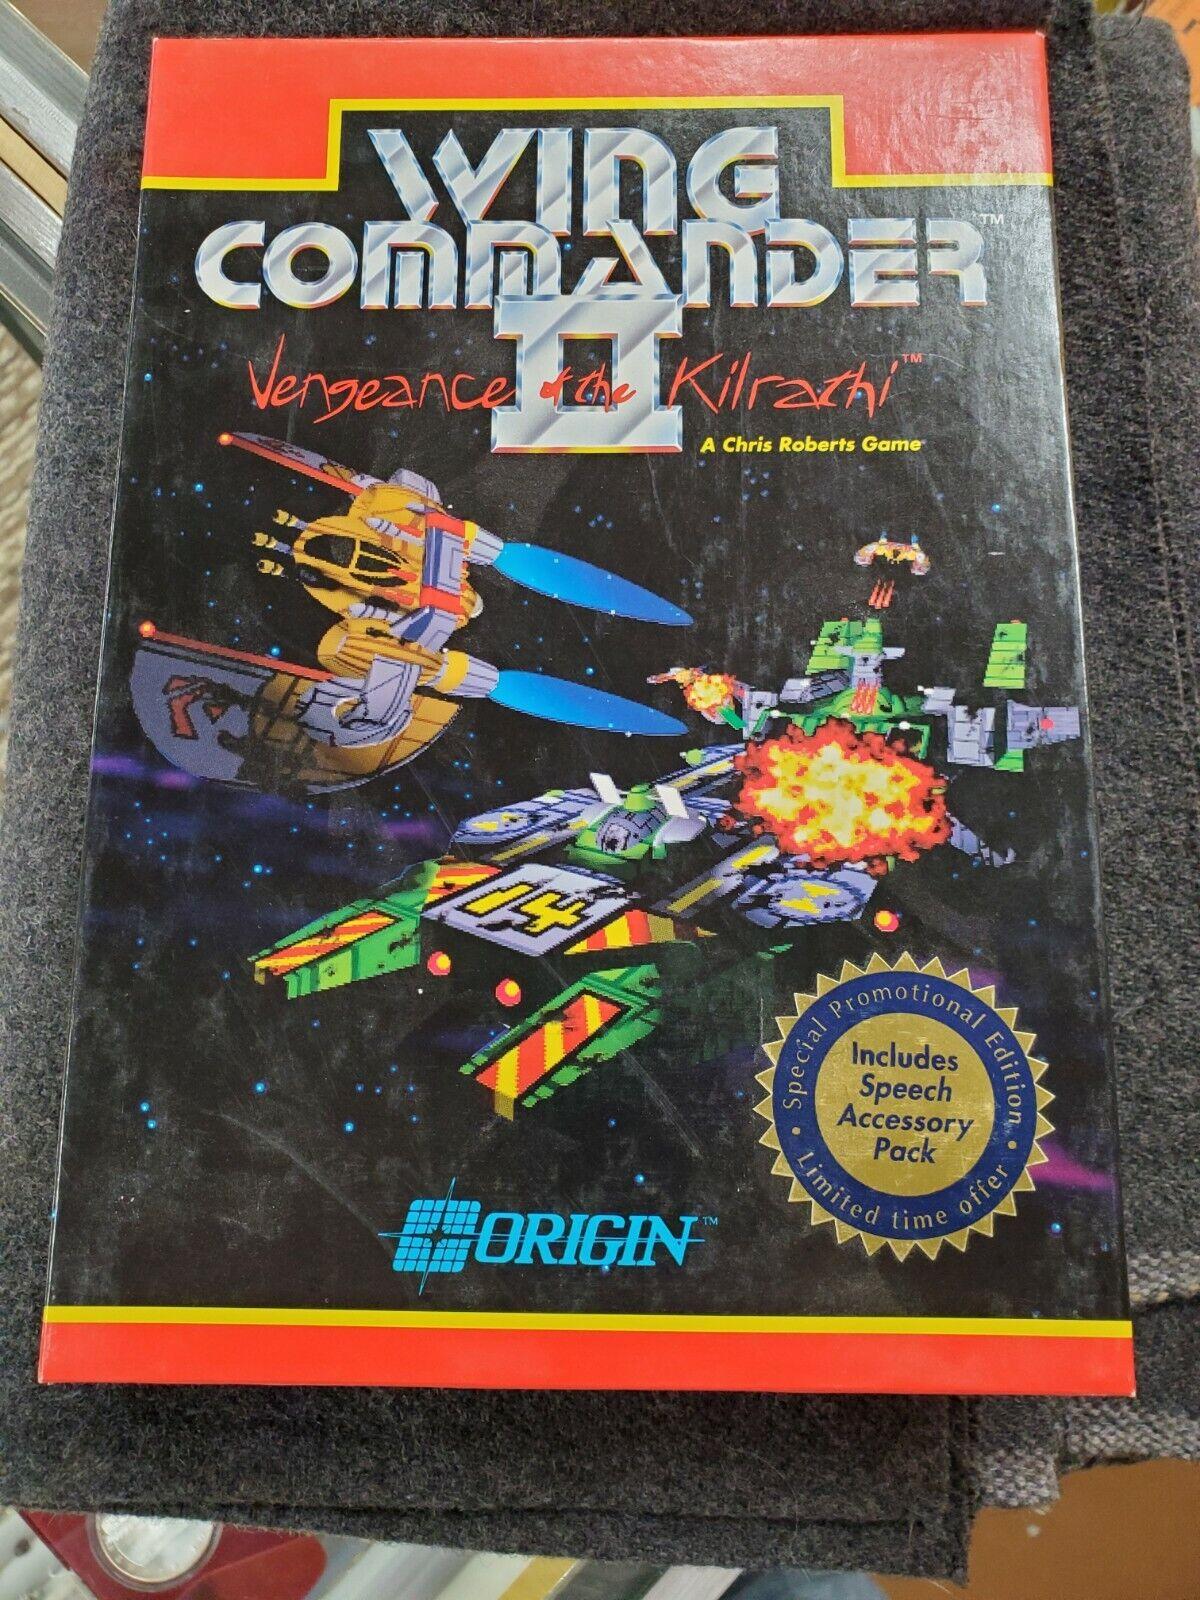 Computer Games - WING COMMANDER II Vengeance Kilrachi IBM PC Dos Origin 5.25 BIG BOX Computer